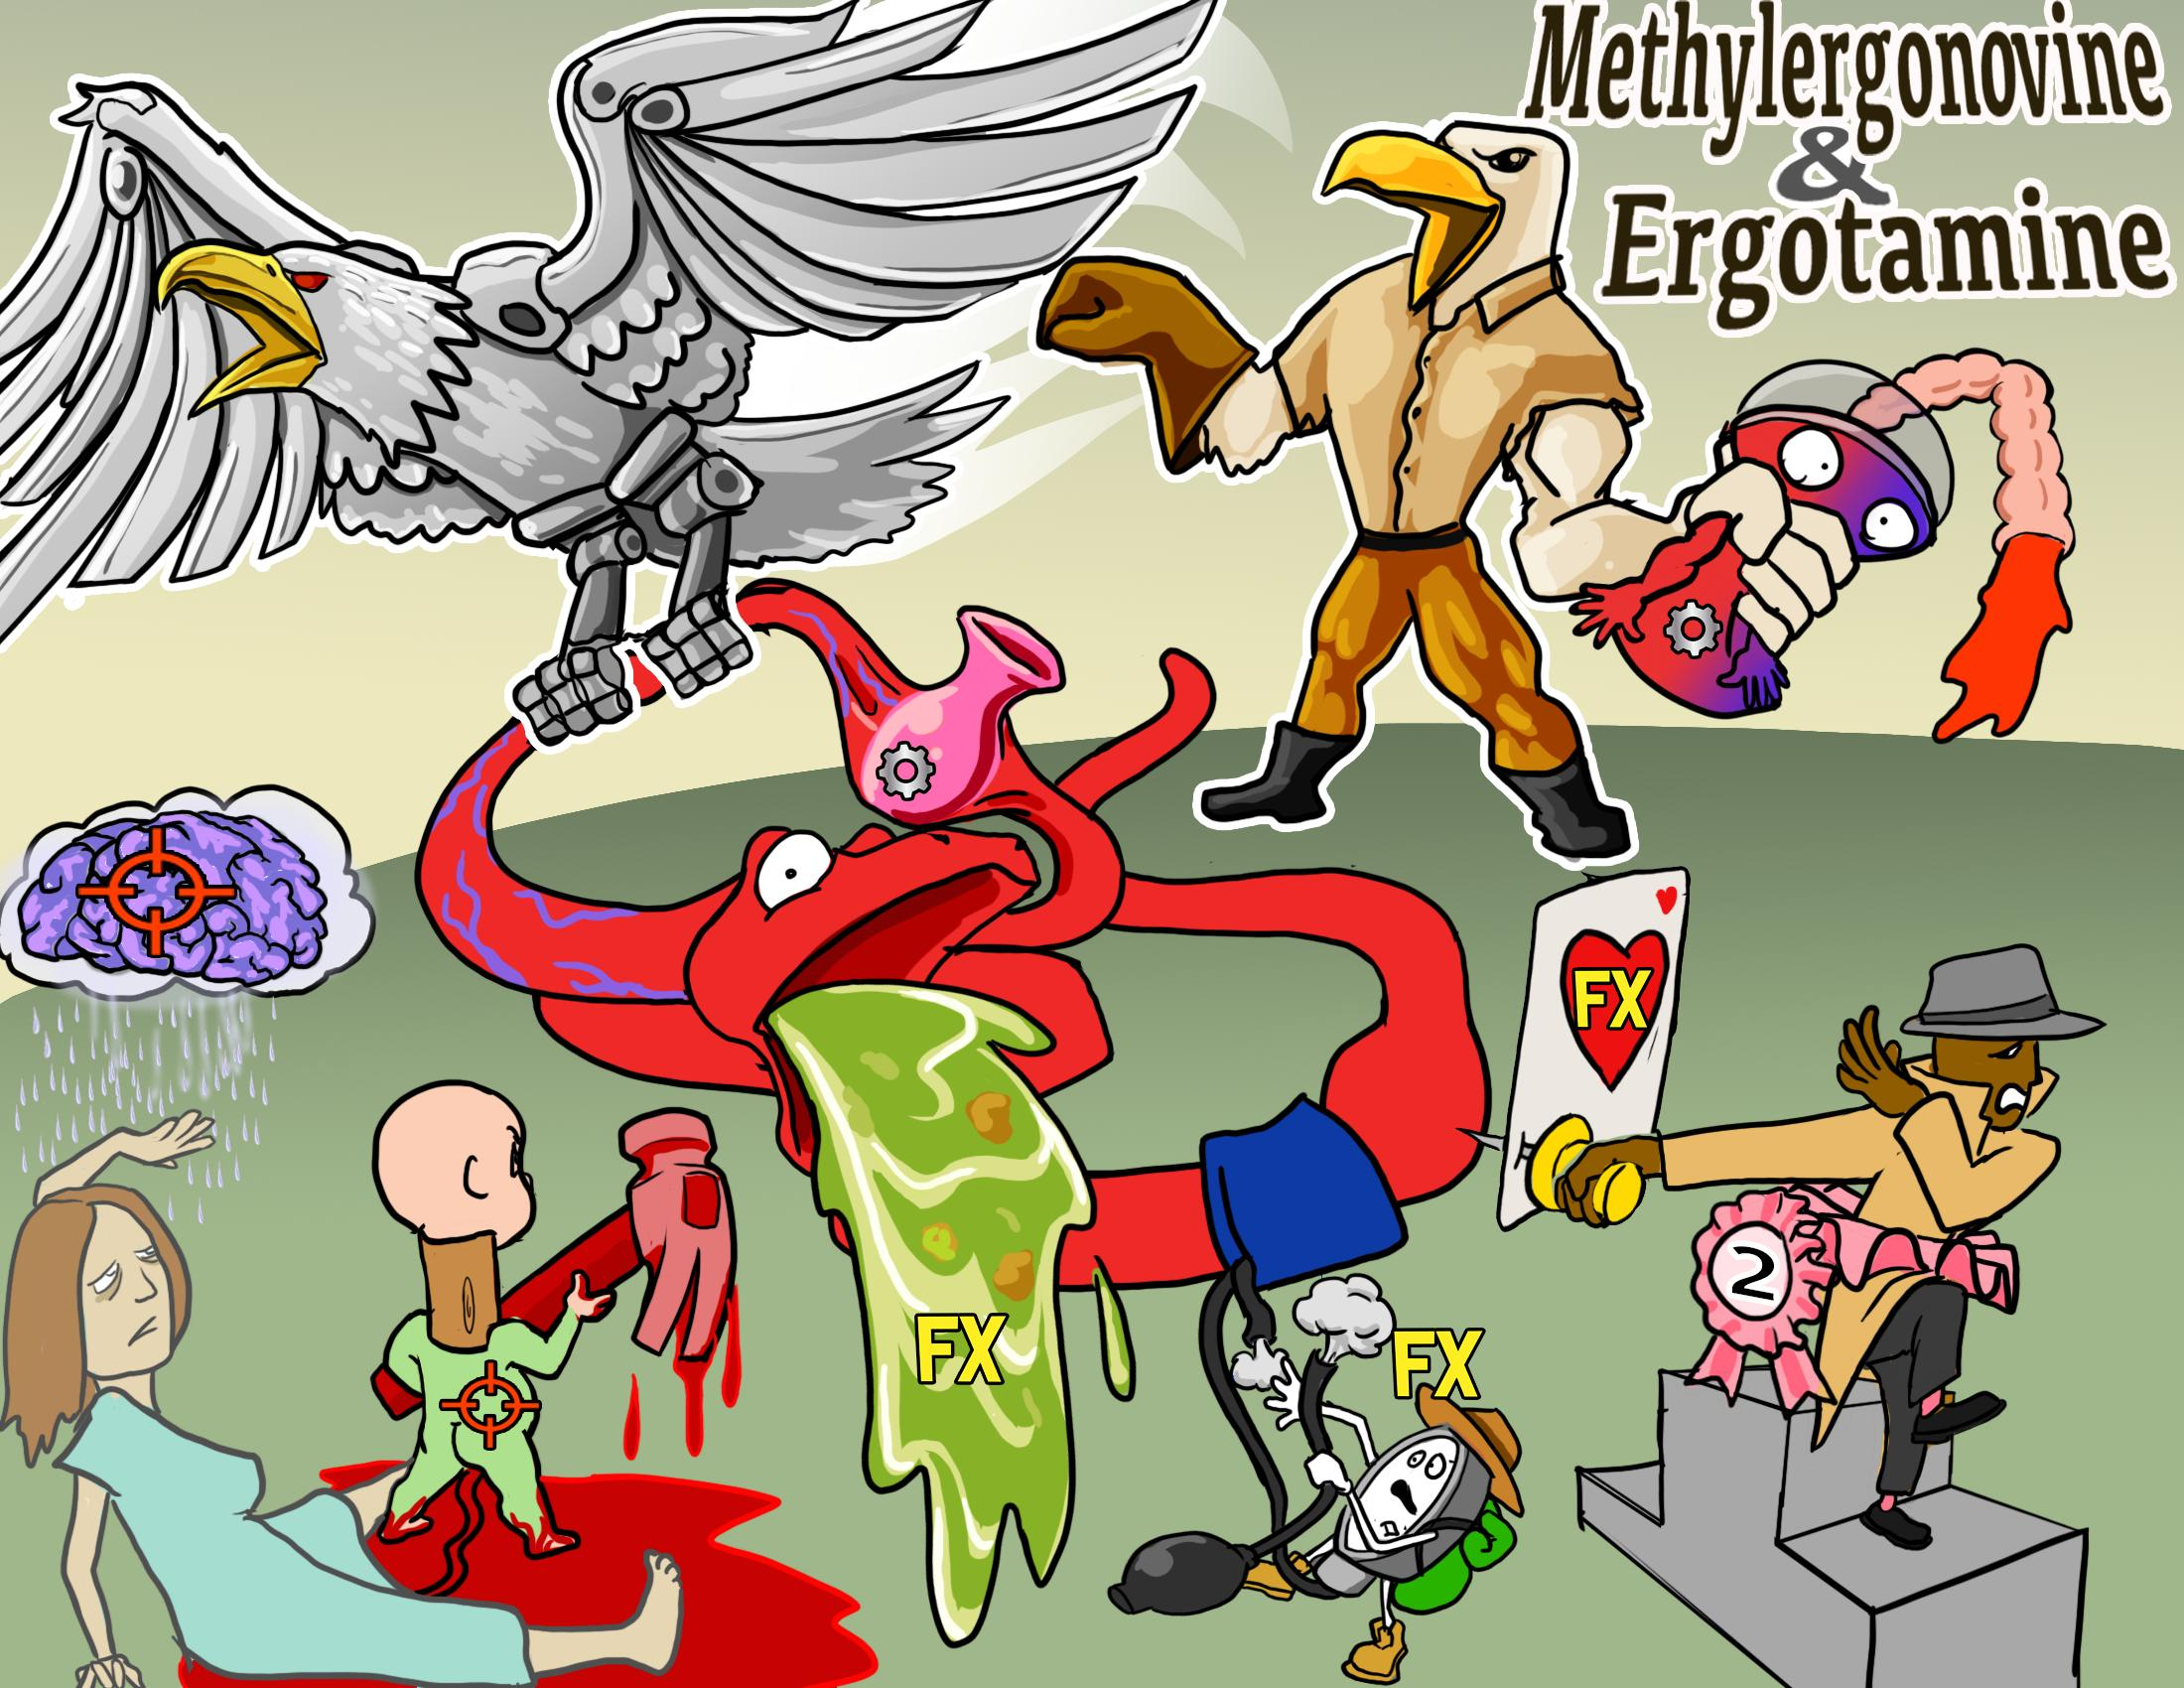 Methylergonovine (Methergine) and Ergotamine (Ergot Alkaloids)